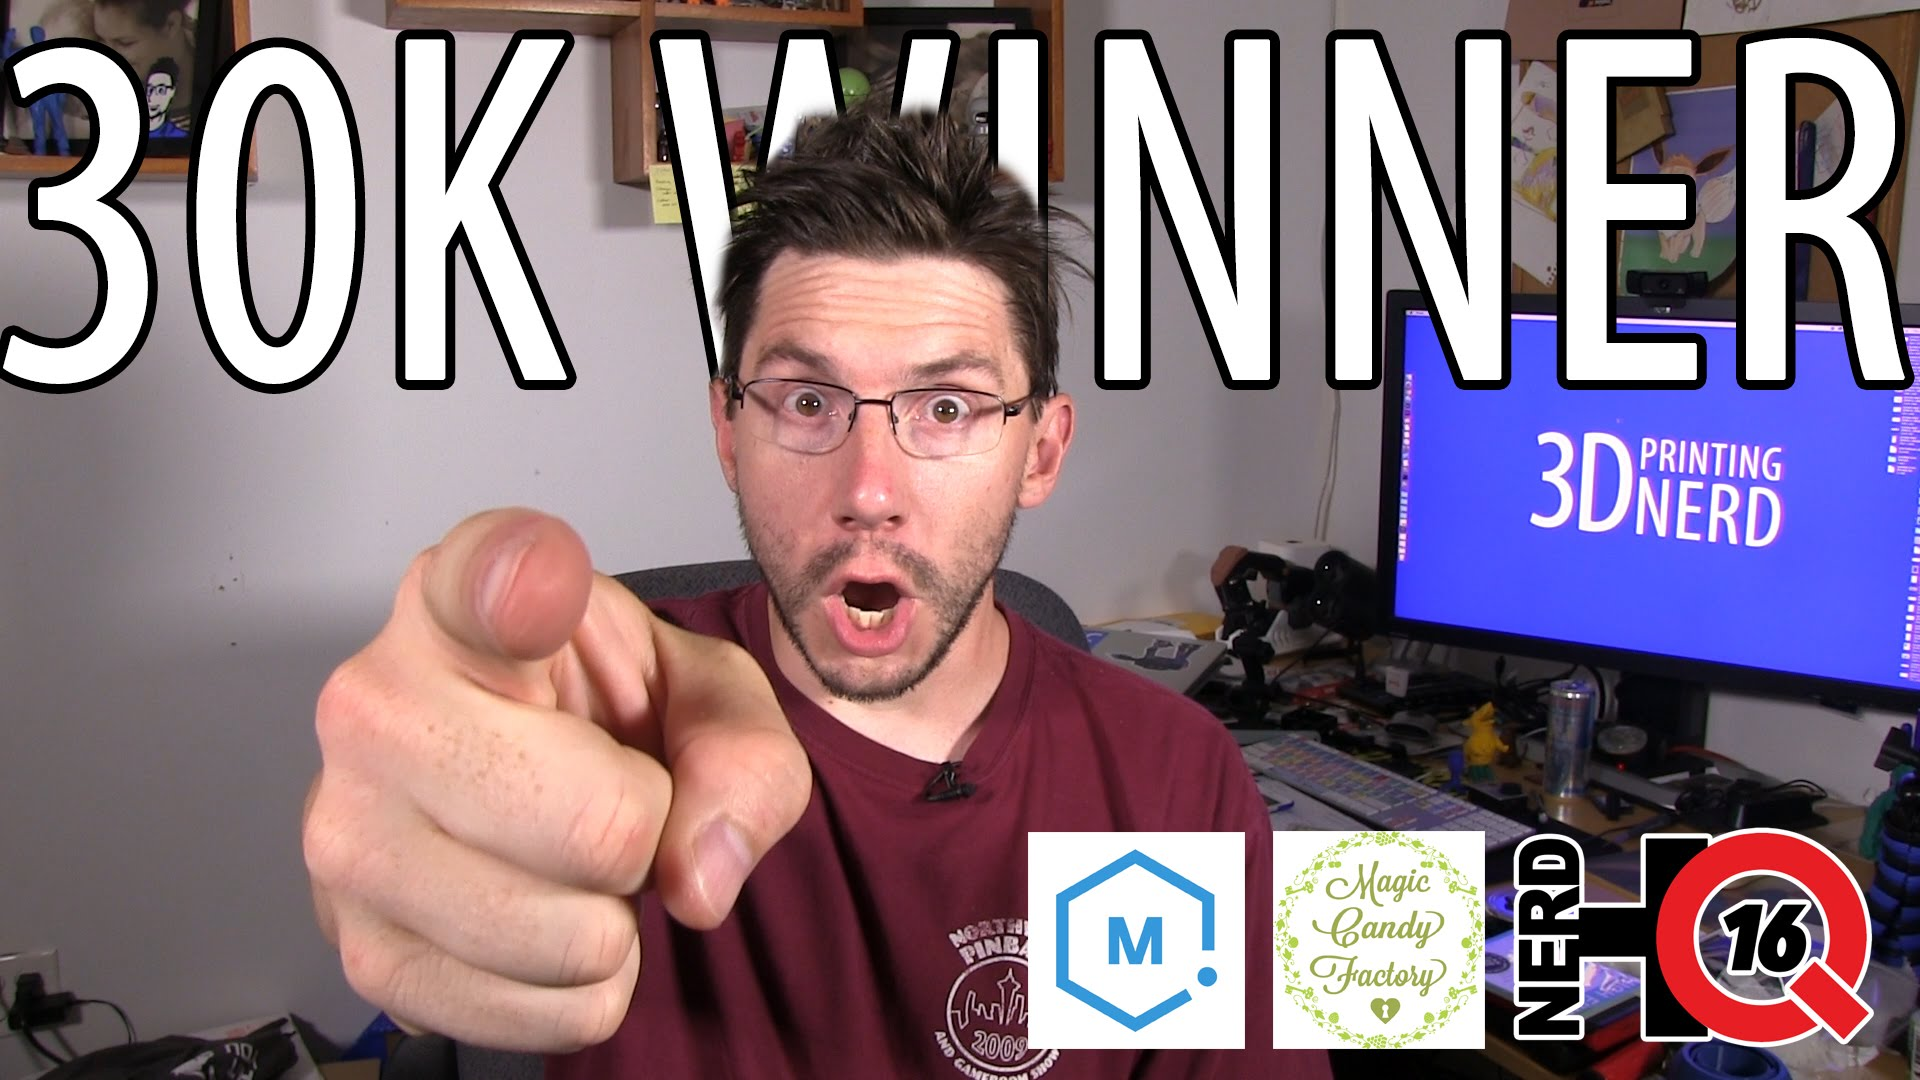 3D Printing: 30K Winner! plus Matterhackers, Magic Candy Factory, #NerdHQ